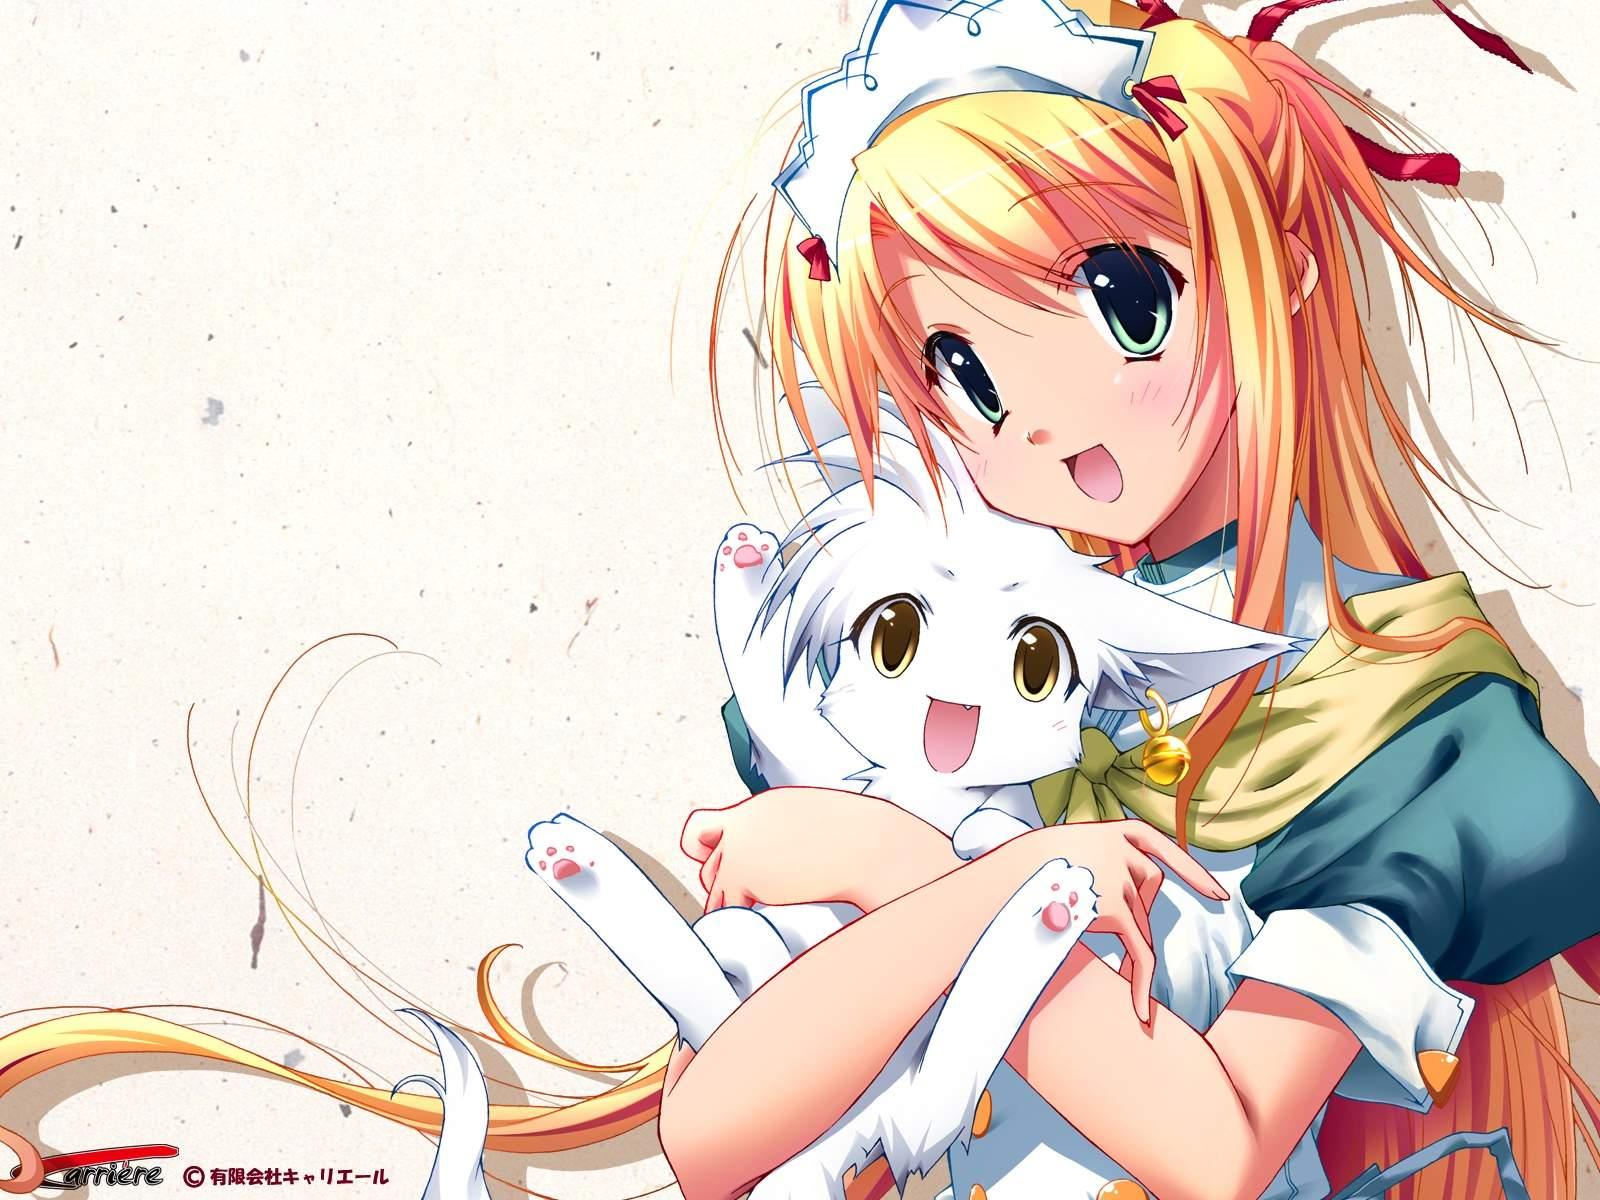 Cute Anime Wallpapers Download Wallpaper DaWallpaperz 1600x1200